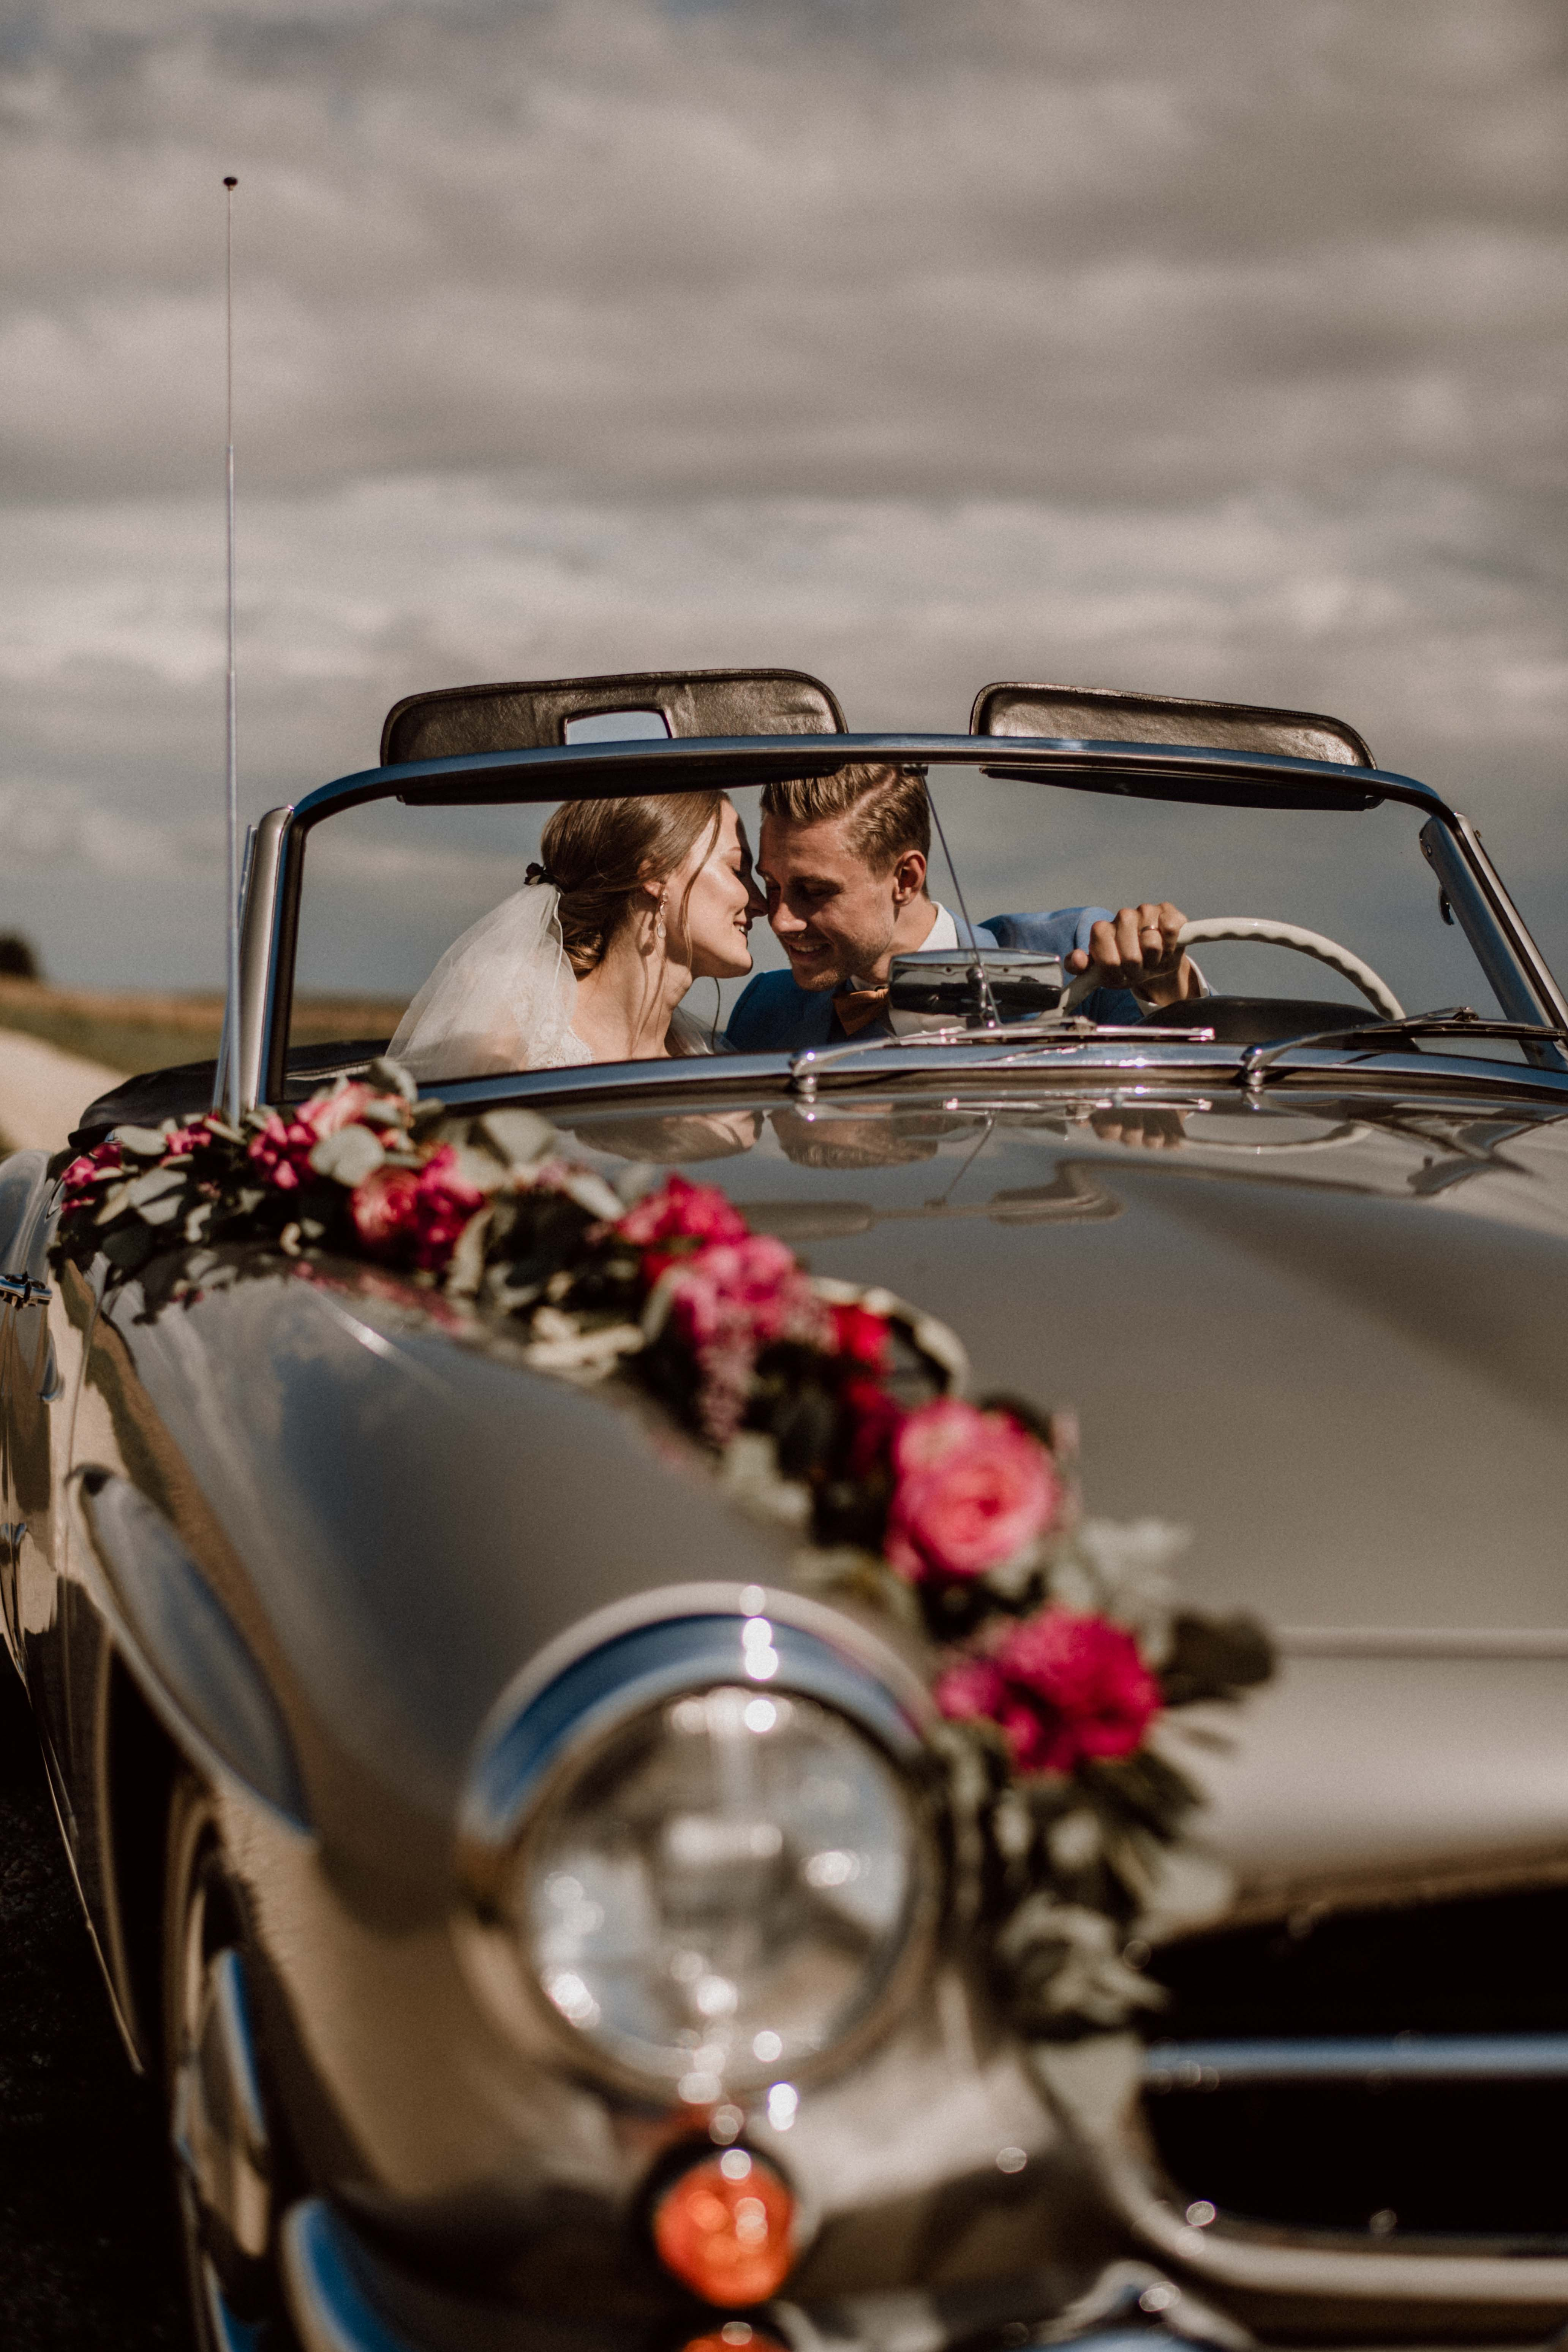 car couple sonja poehlmann photography couples muenchen bayern